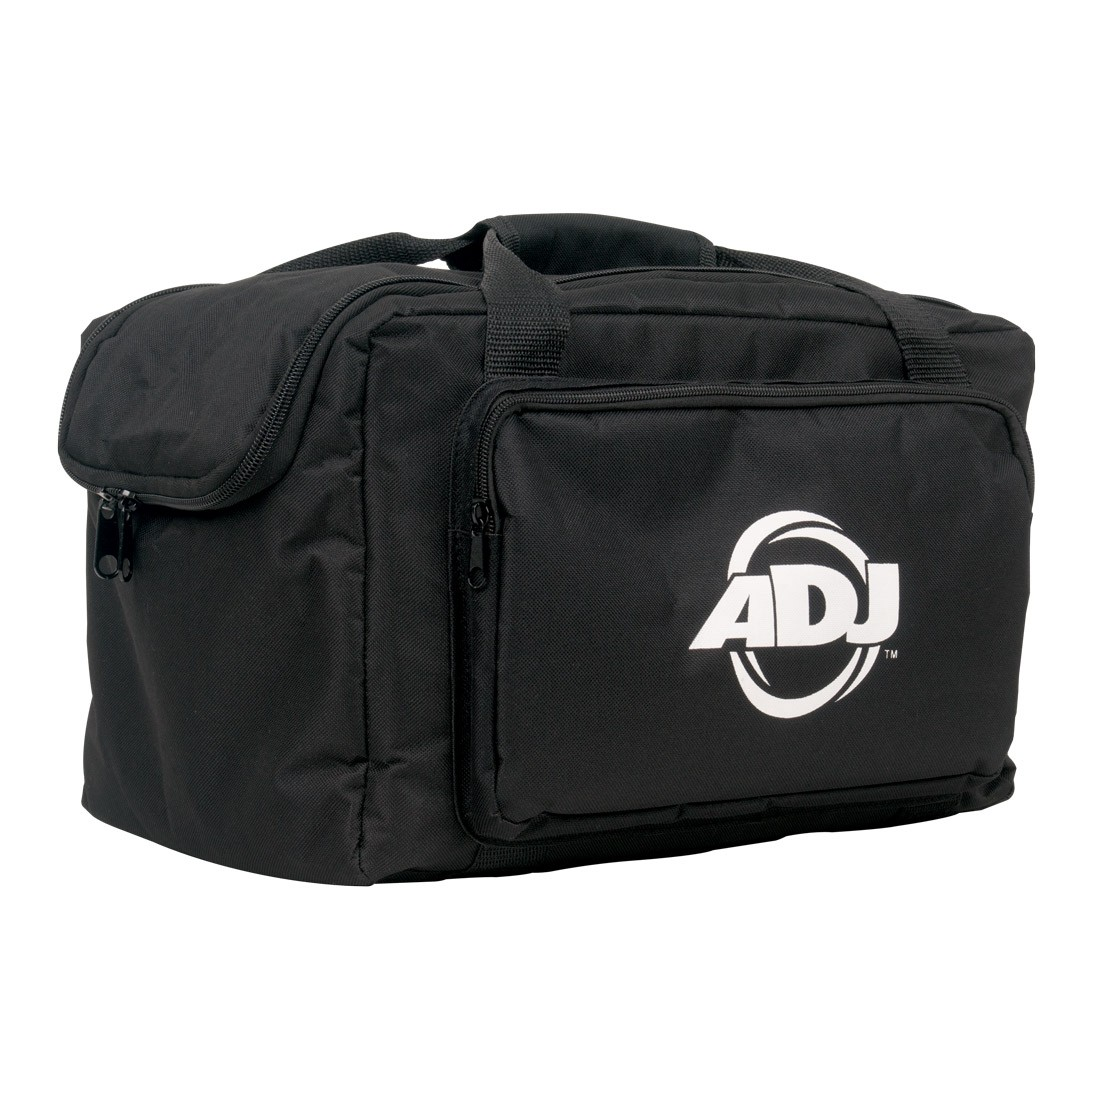 ADJ Flat Par Bag 4